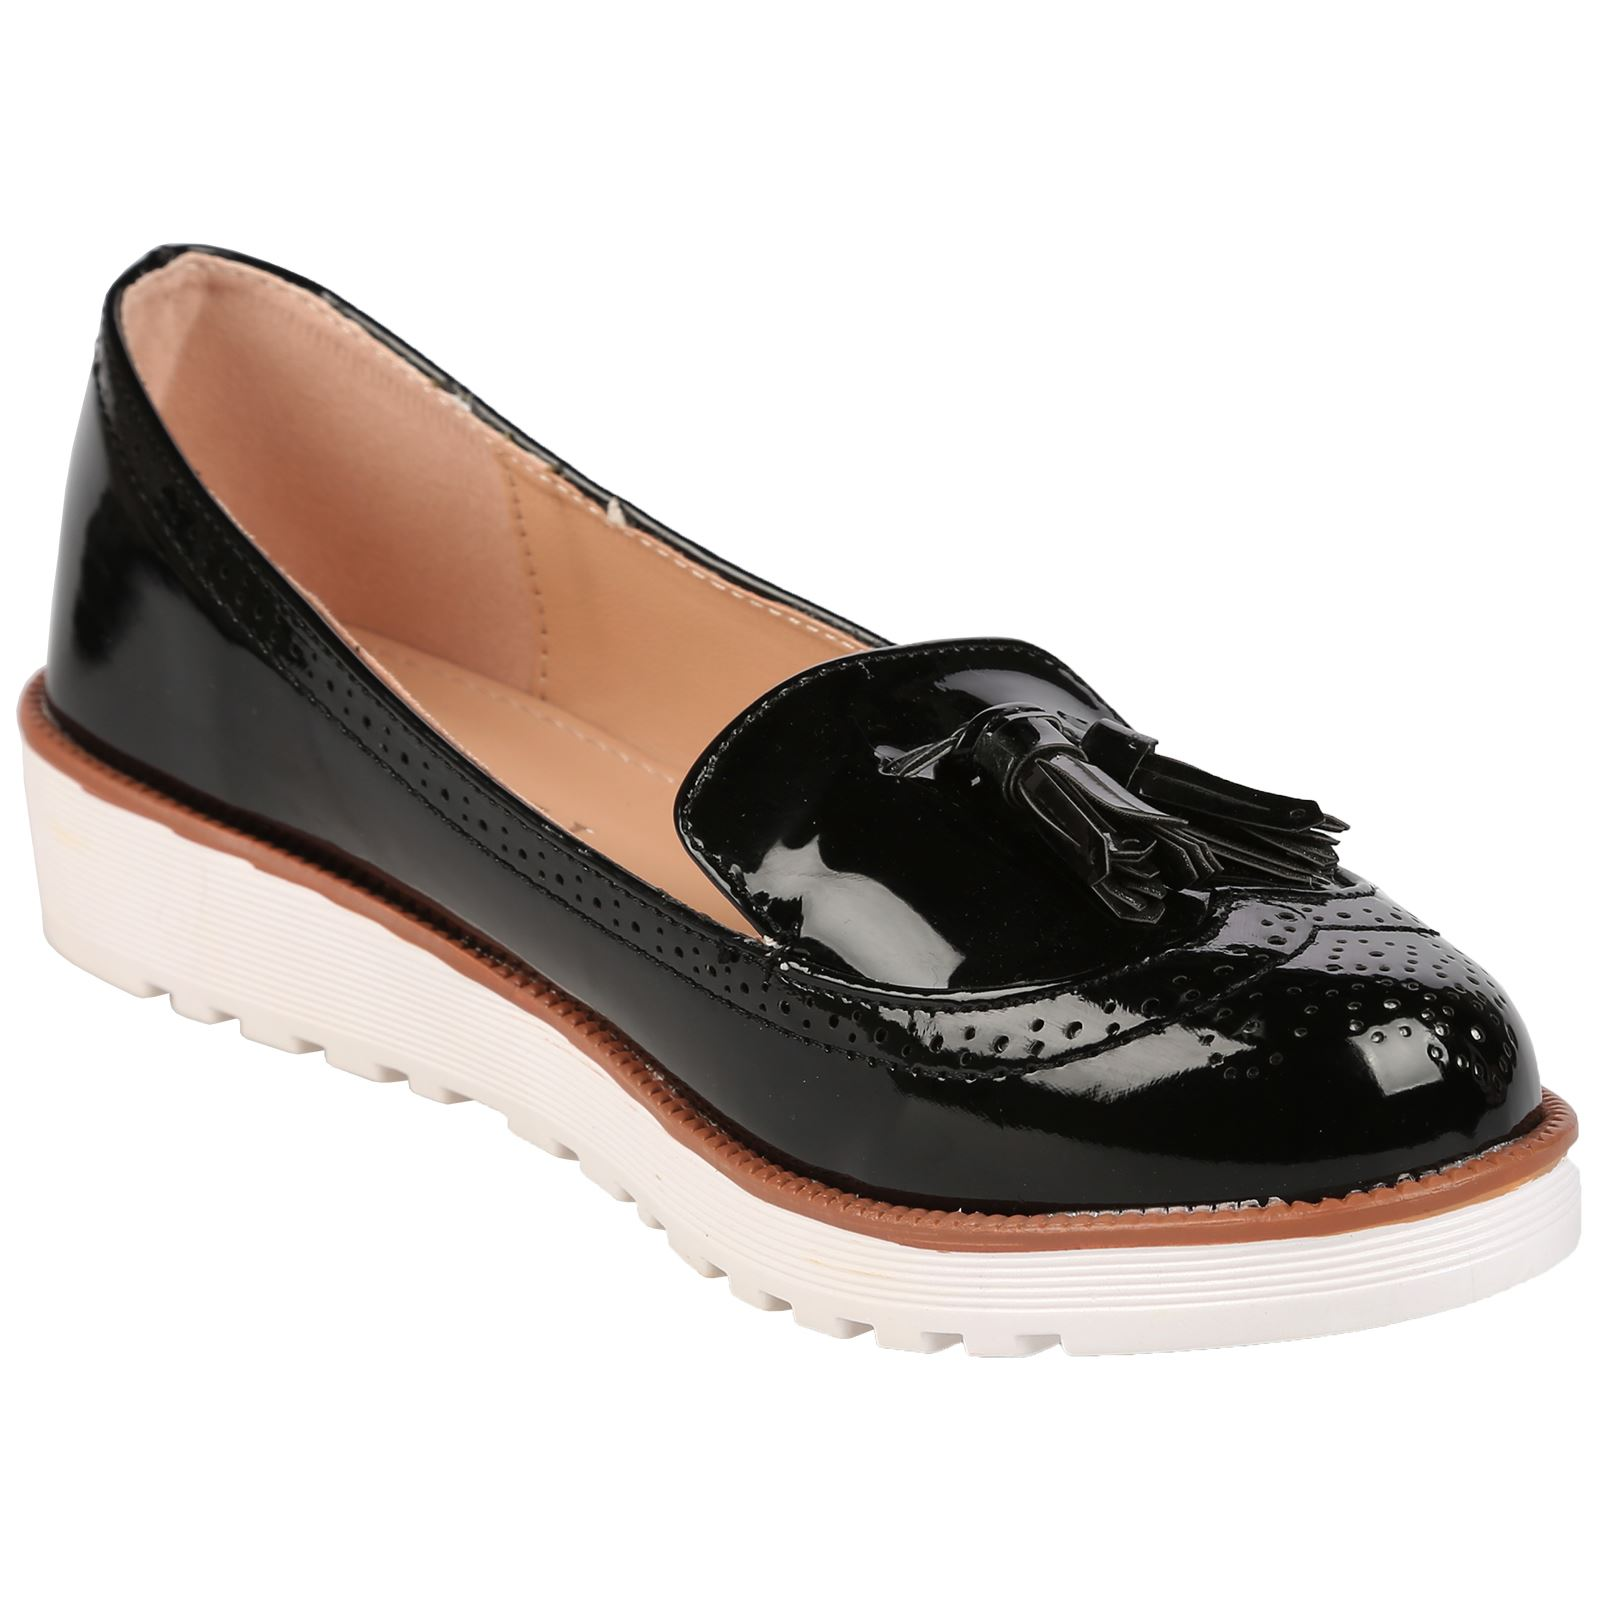 ladies pumps womens flat shoes loafers tassel fringe